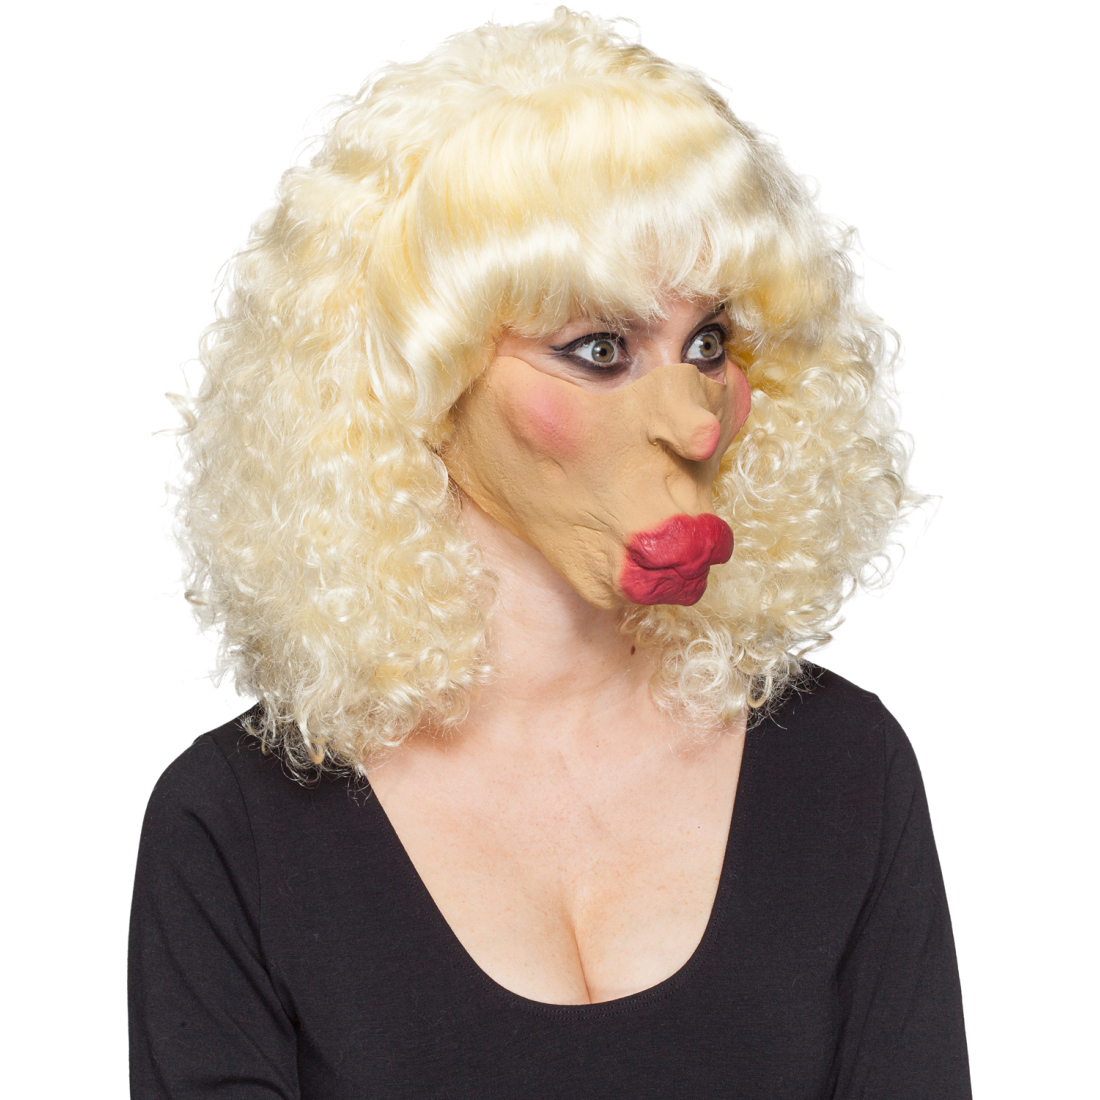 Kussmund Maske Lippen Faschingsmaske Kuss Latexmaske